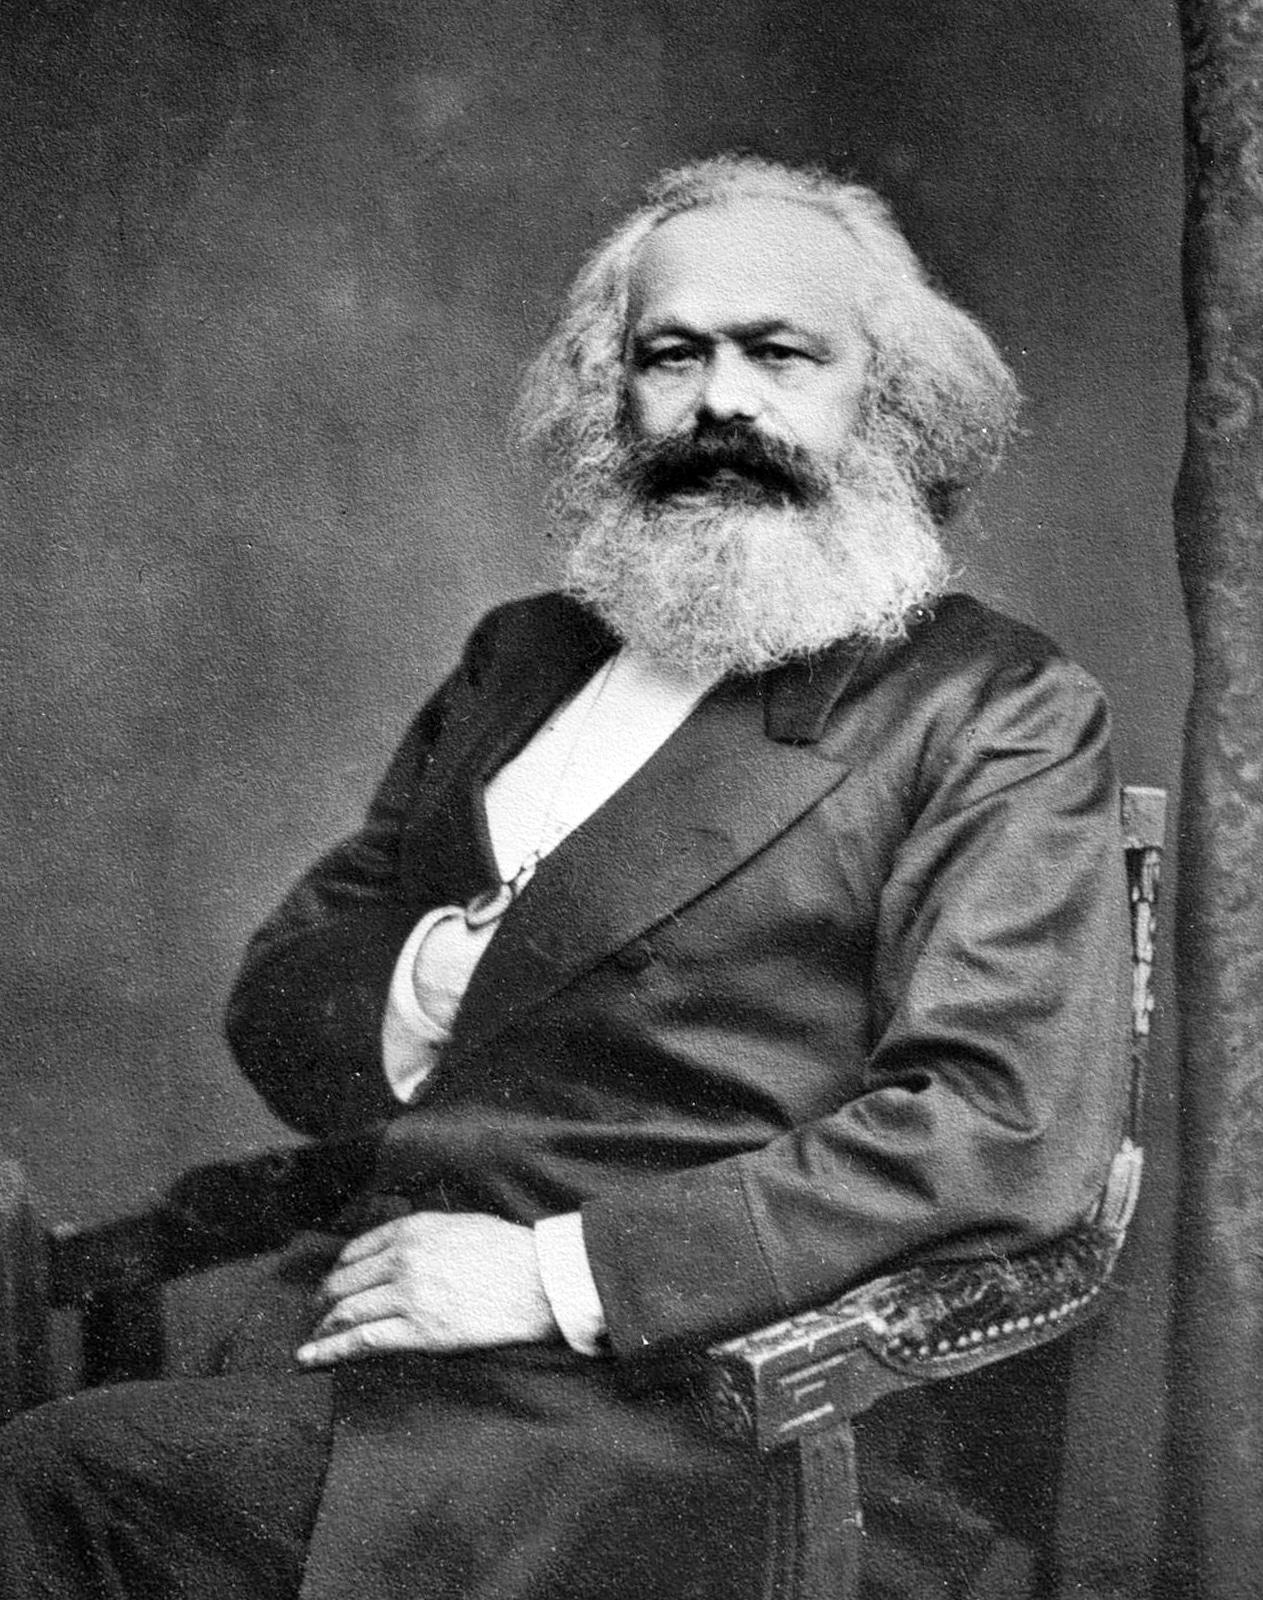 d4a2580e40e3b19e4e5473de26afa1d6 1 - Karl Marx: His Life and Environment